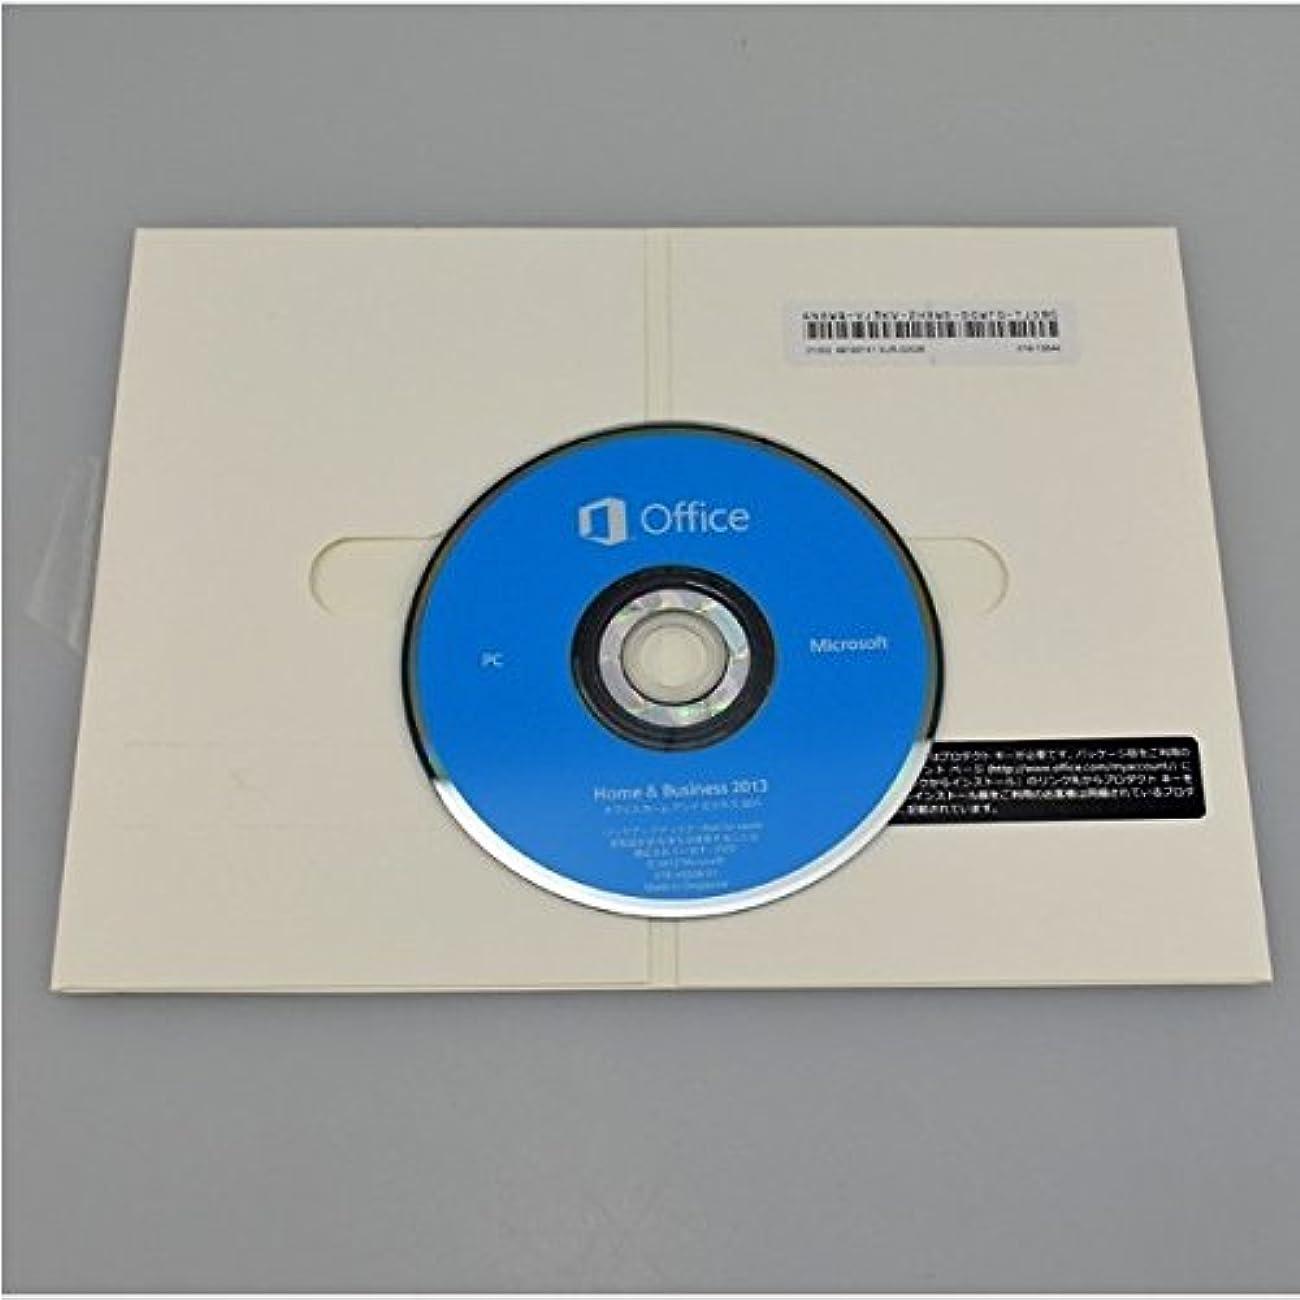 例展開する演劇Office Home and Business 2013 日本語版 64bit 新品未開封 認証保証